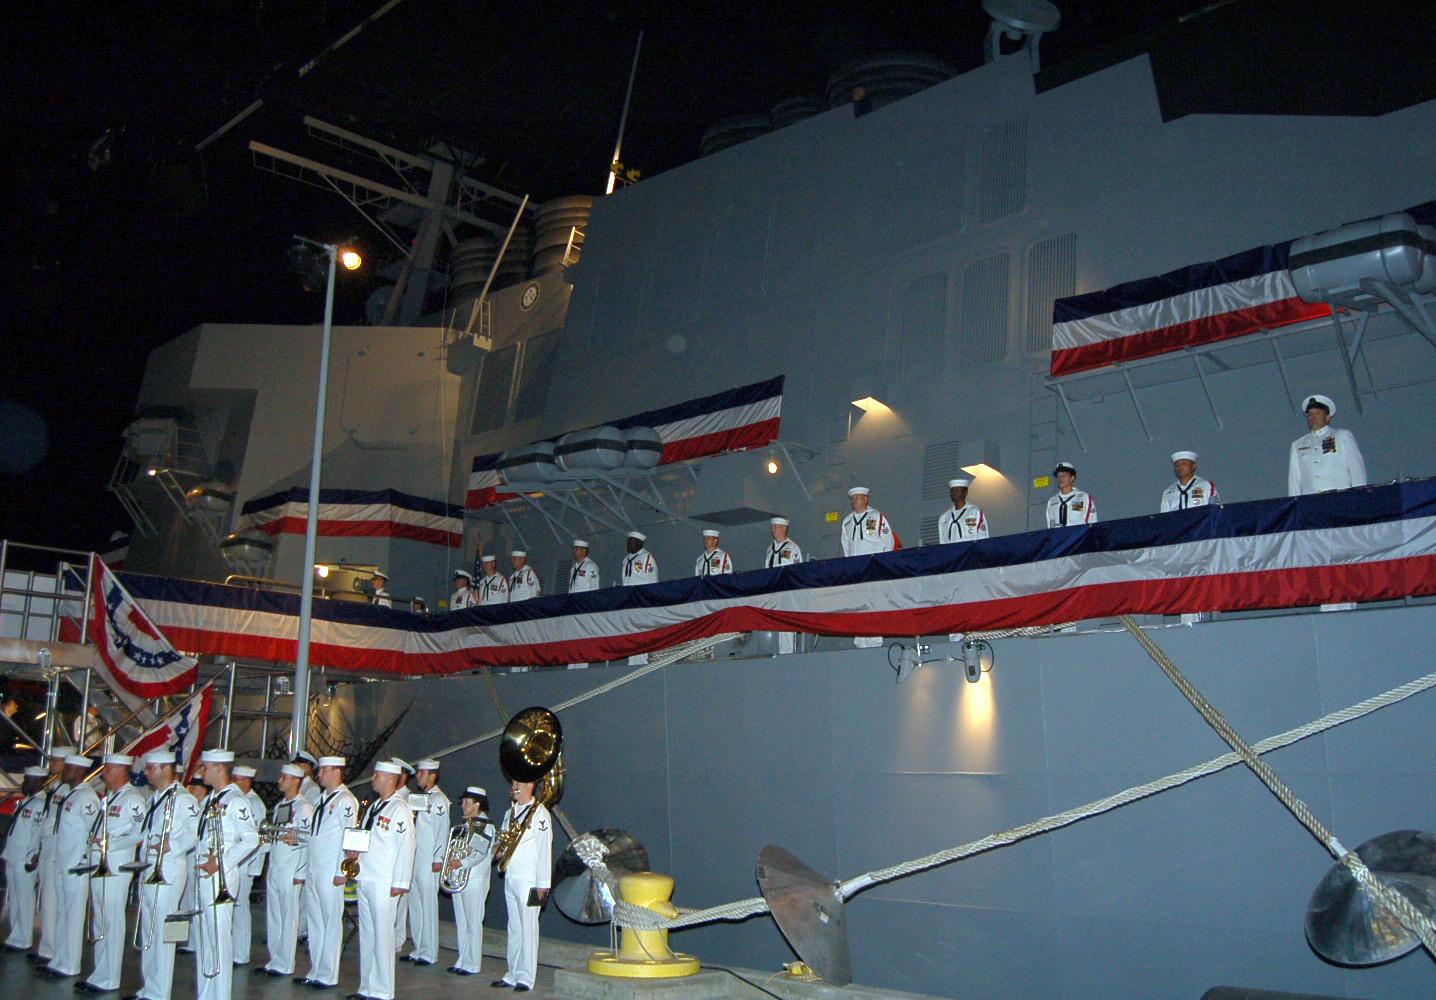 Sailors_man_the_rails_of_USS_Trayer_(BST_21).jpg